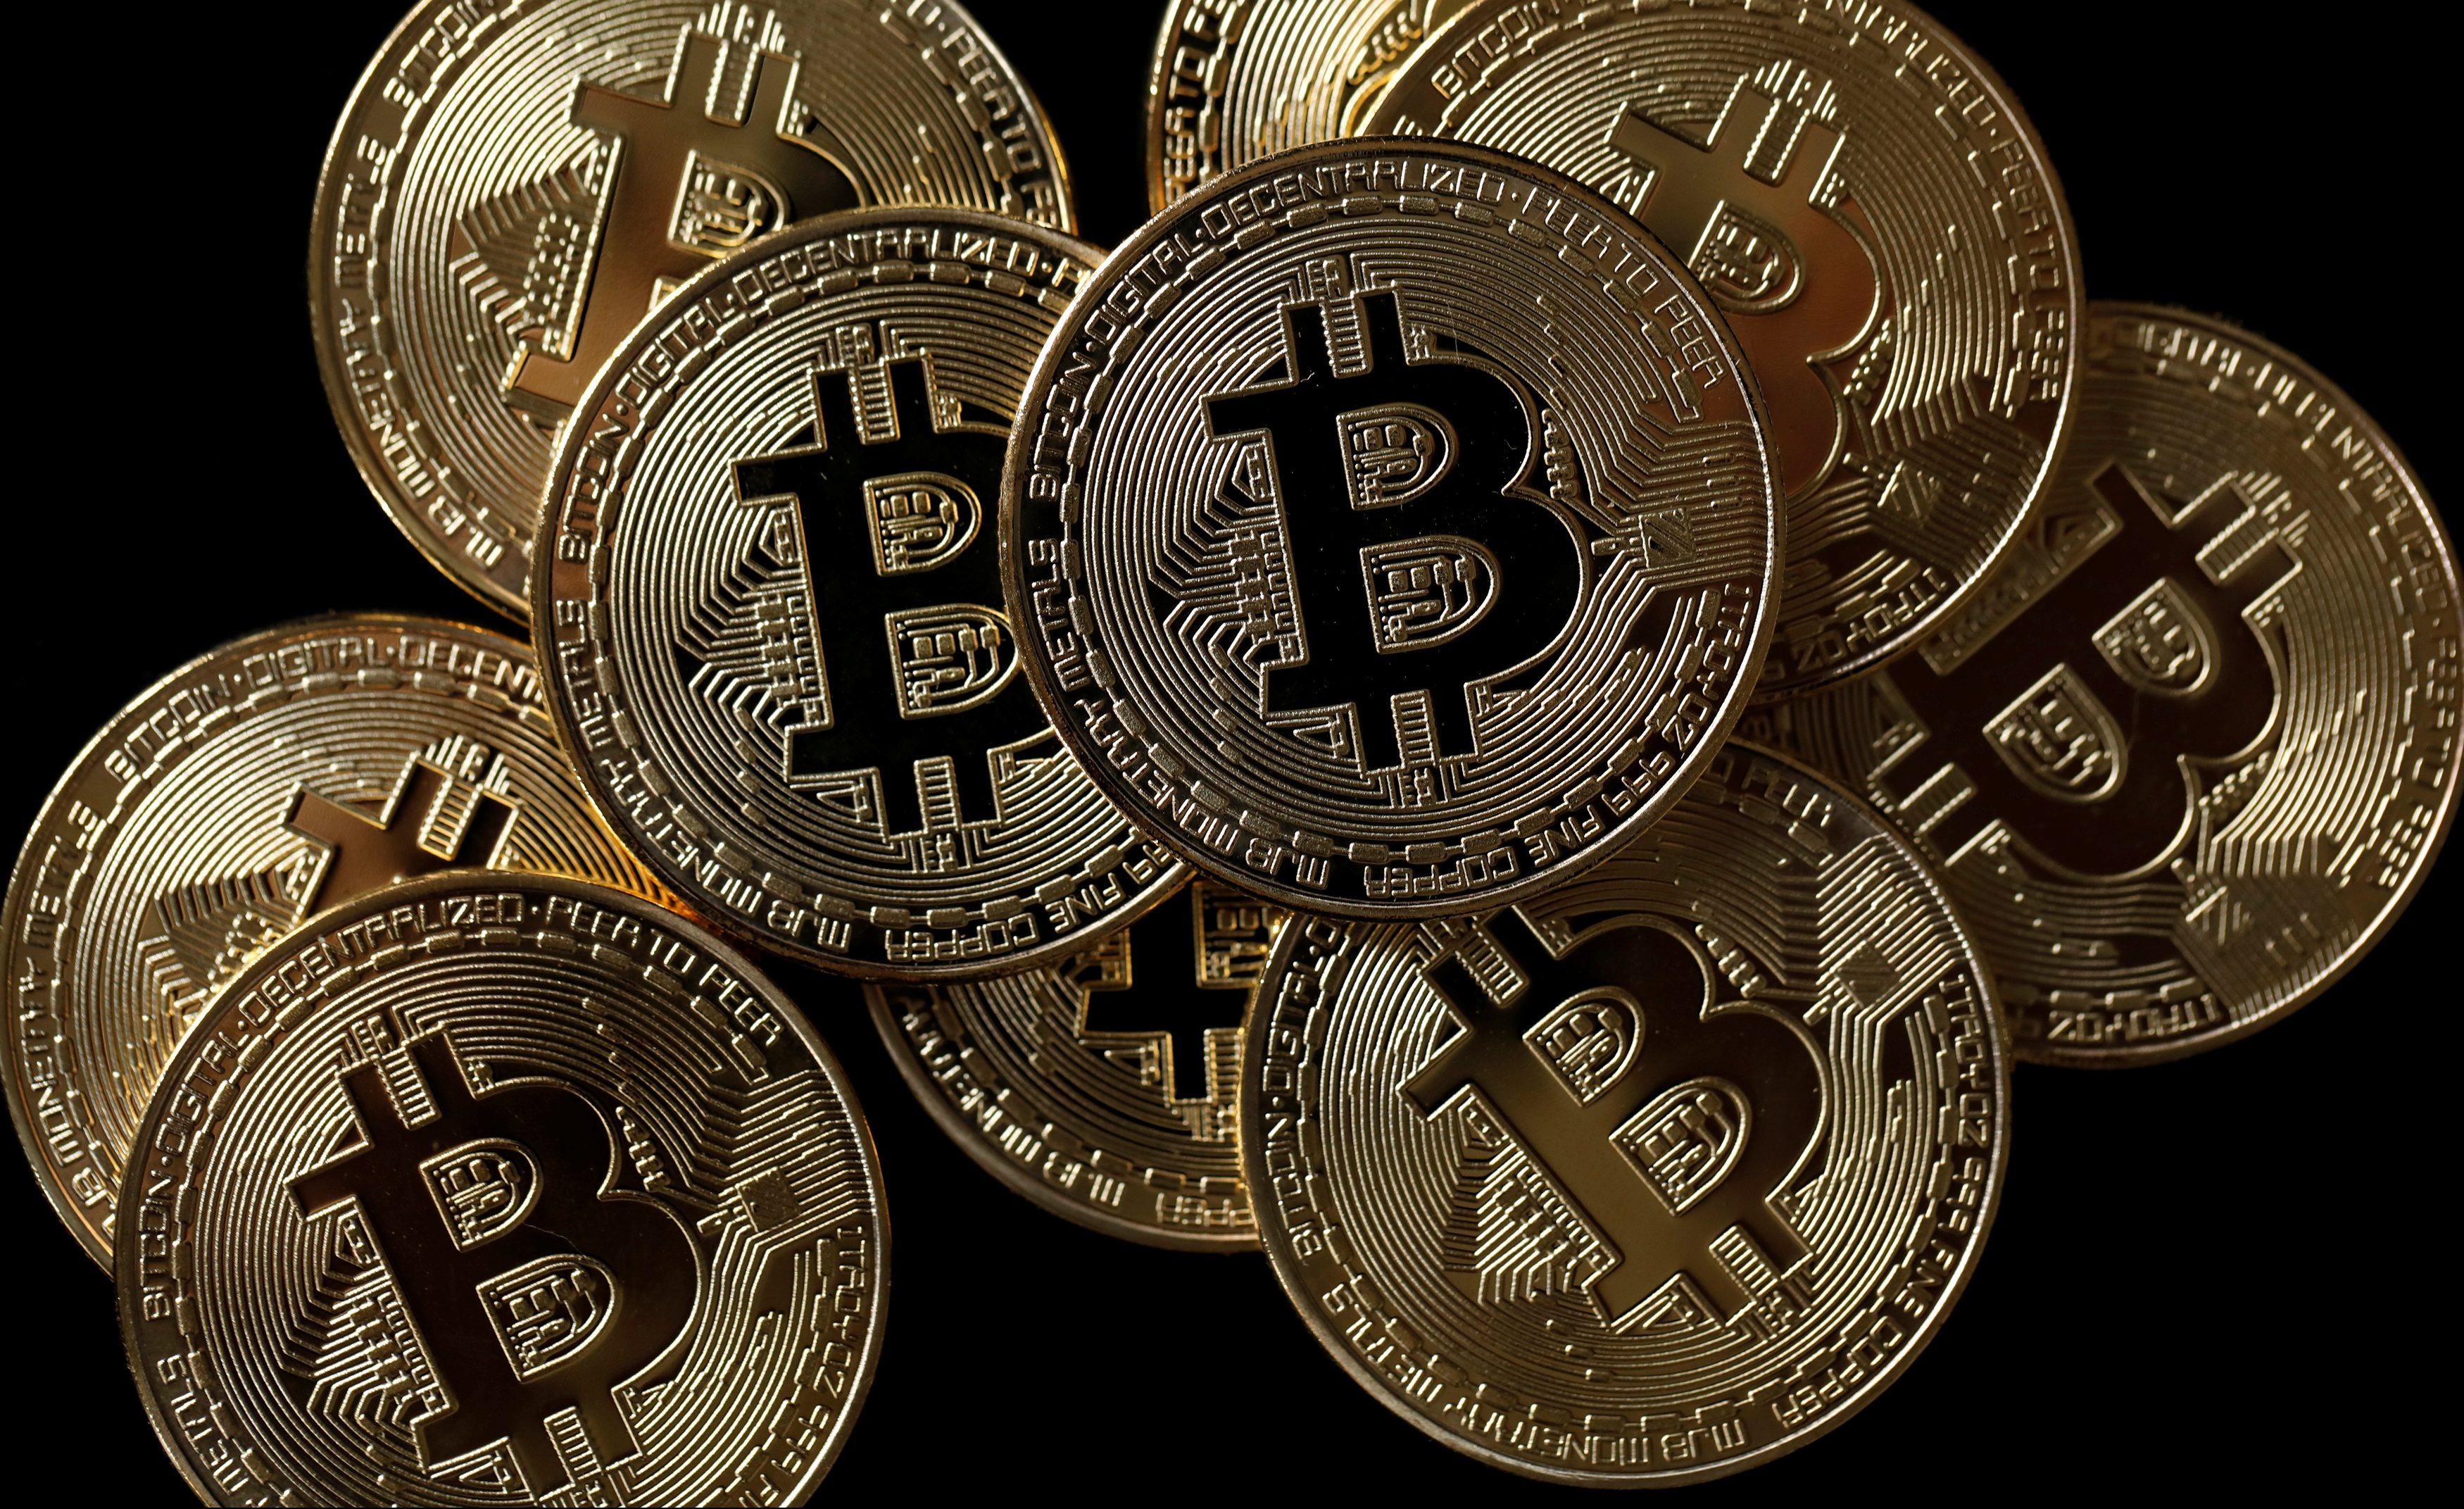 Satoshi to bitcoins bets on ufc